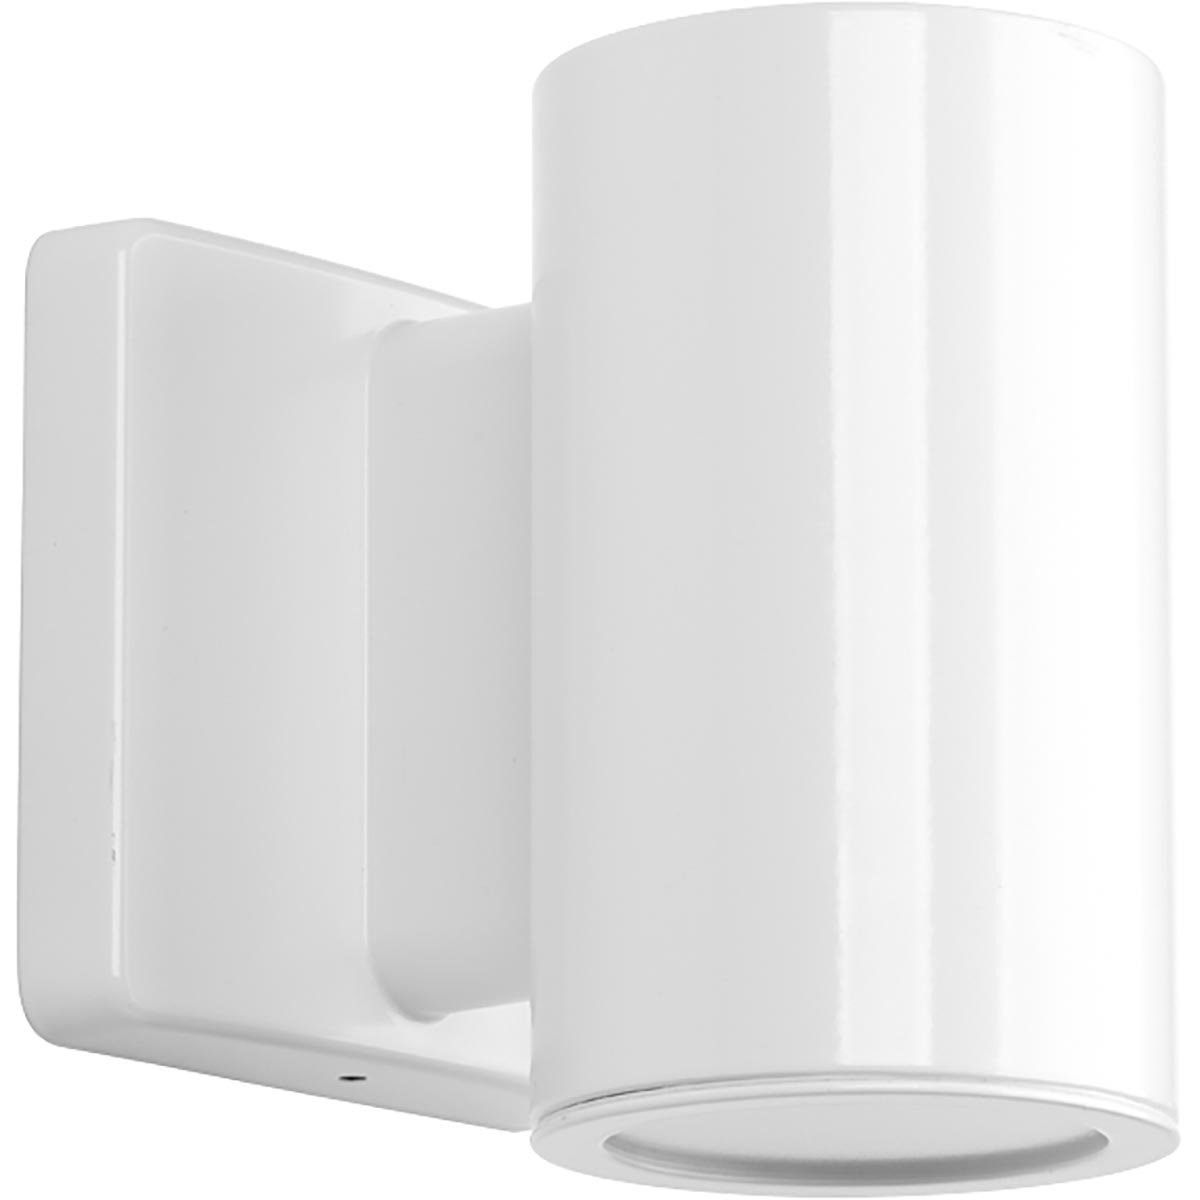 Progress Lighting P563000-030-30K 3IN Cylinders Wall Lantern, White